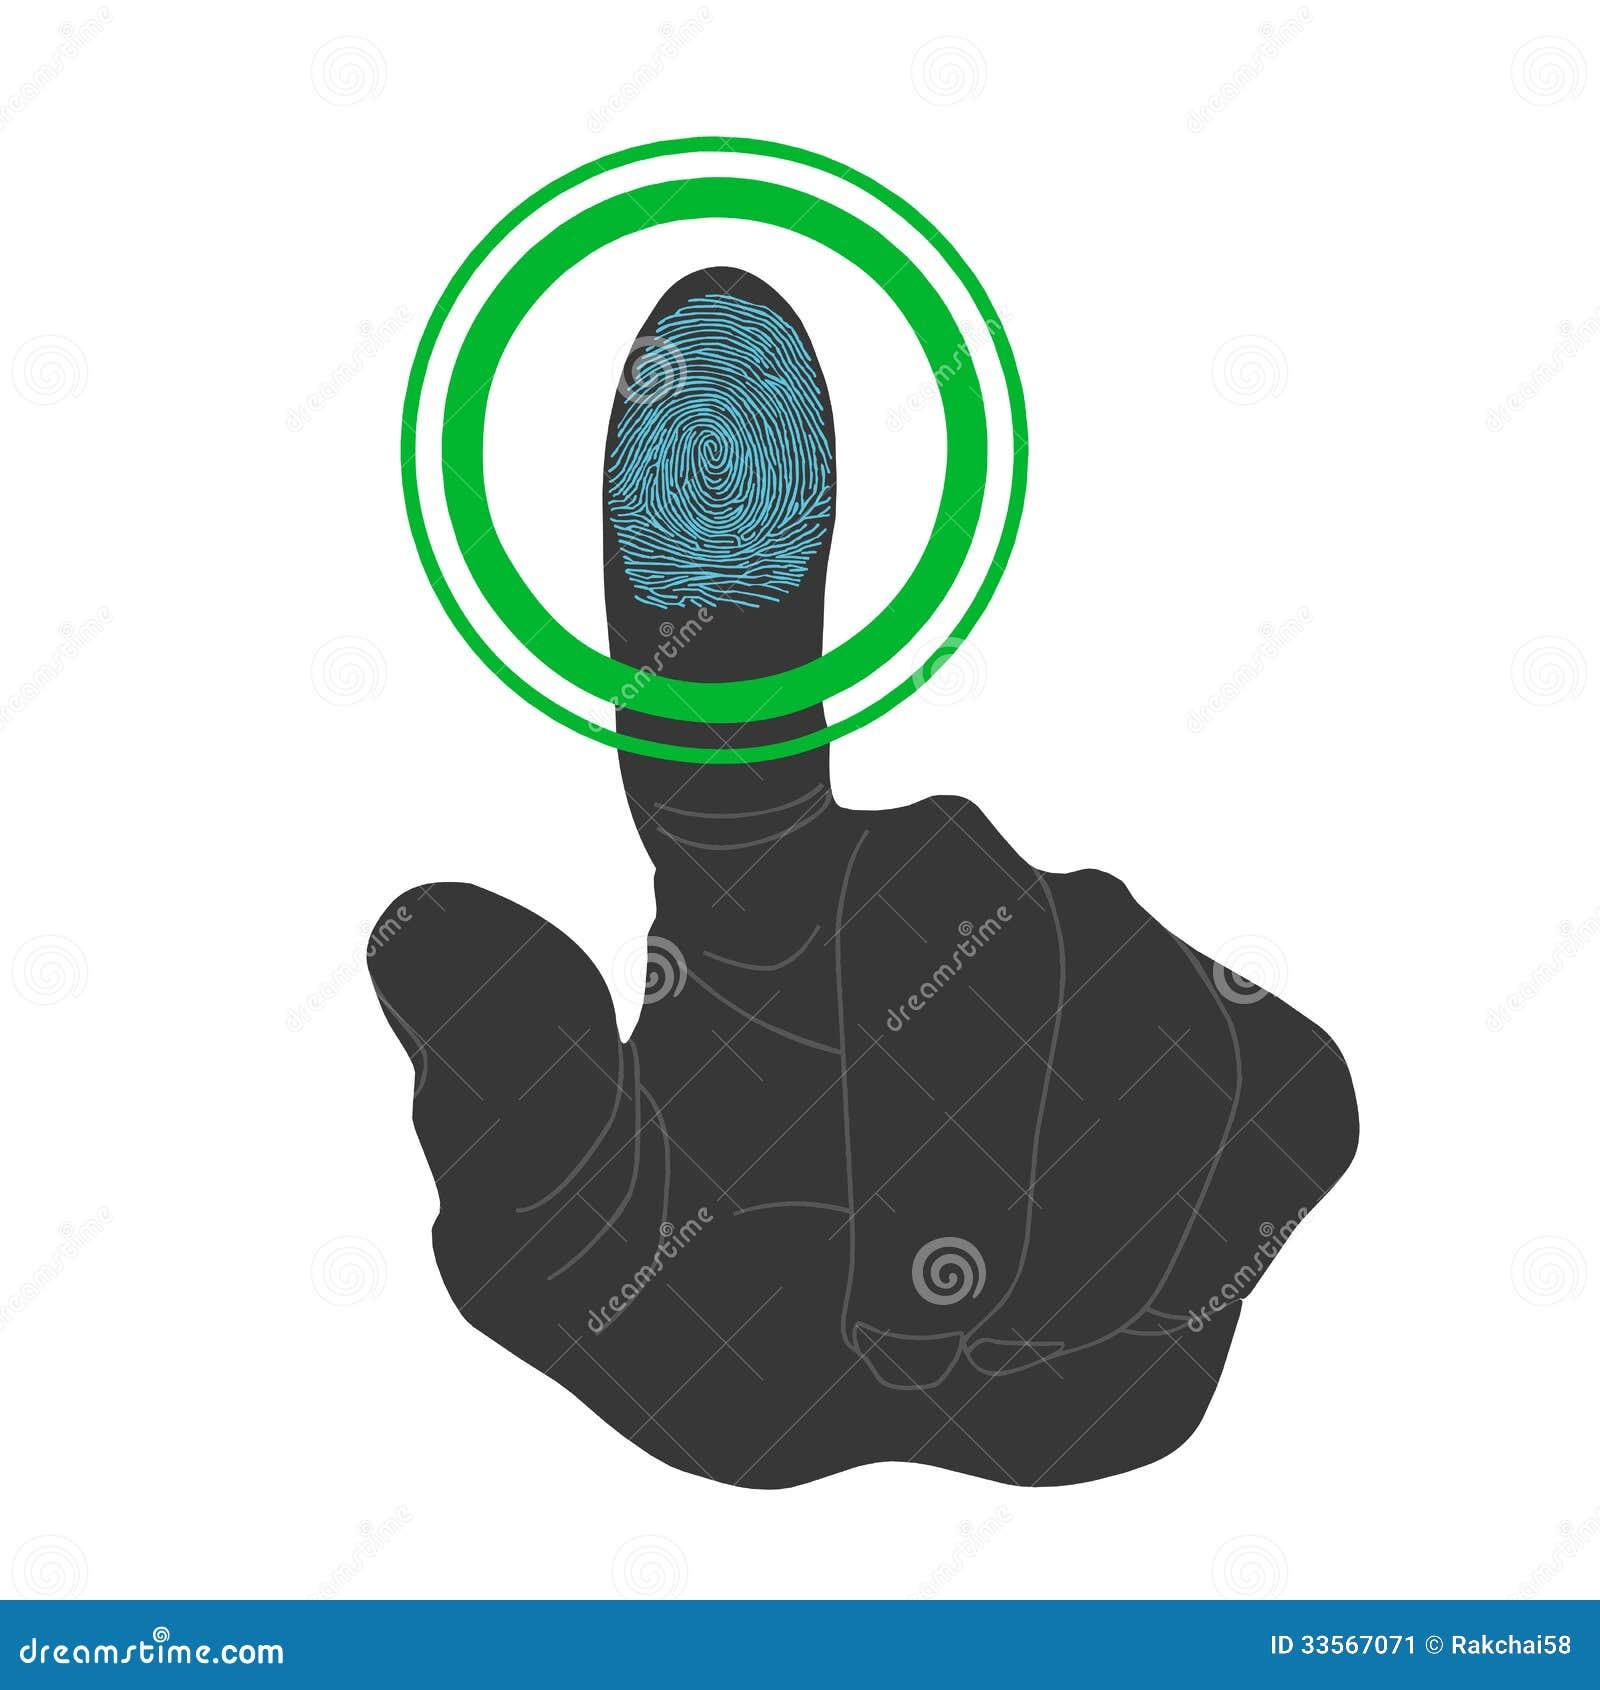 Touch Id Fingerprint Scan Access Symbol Stock Vector